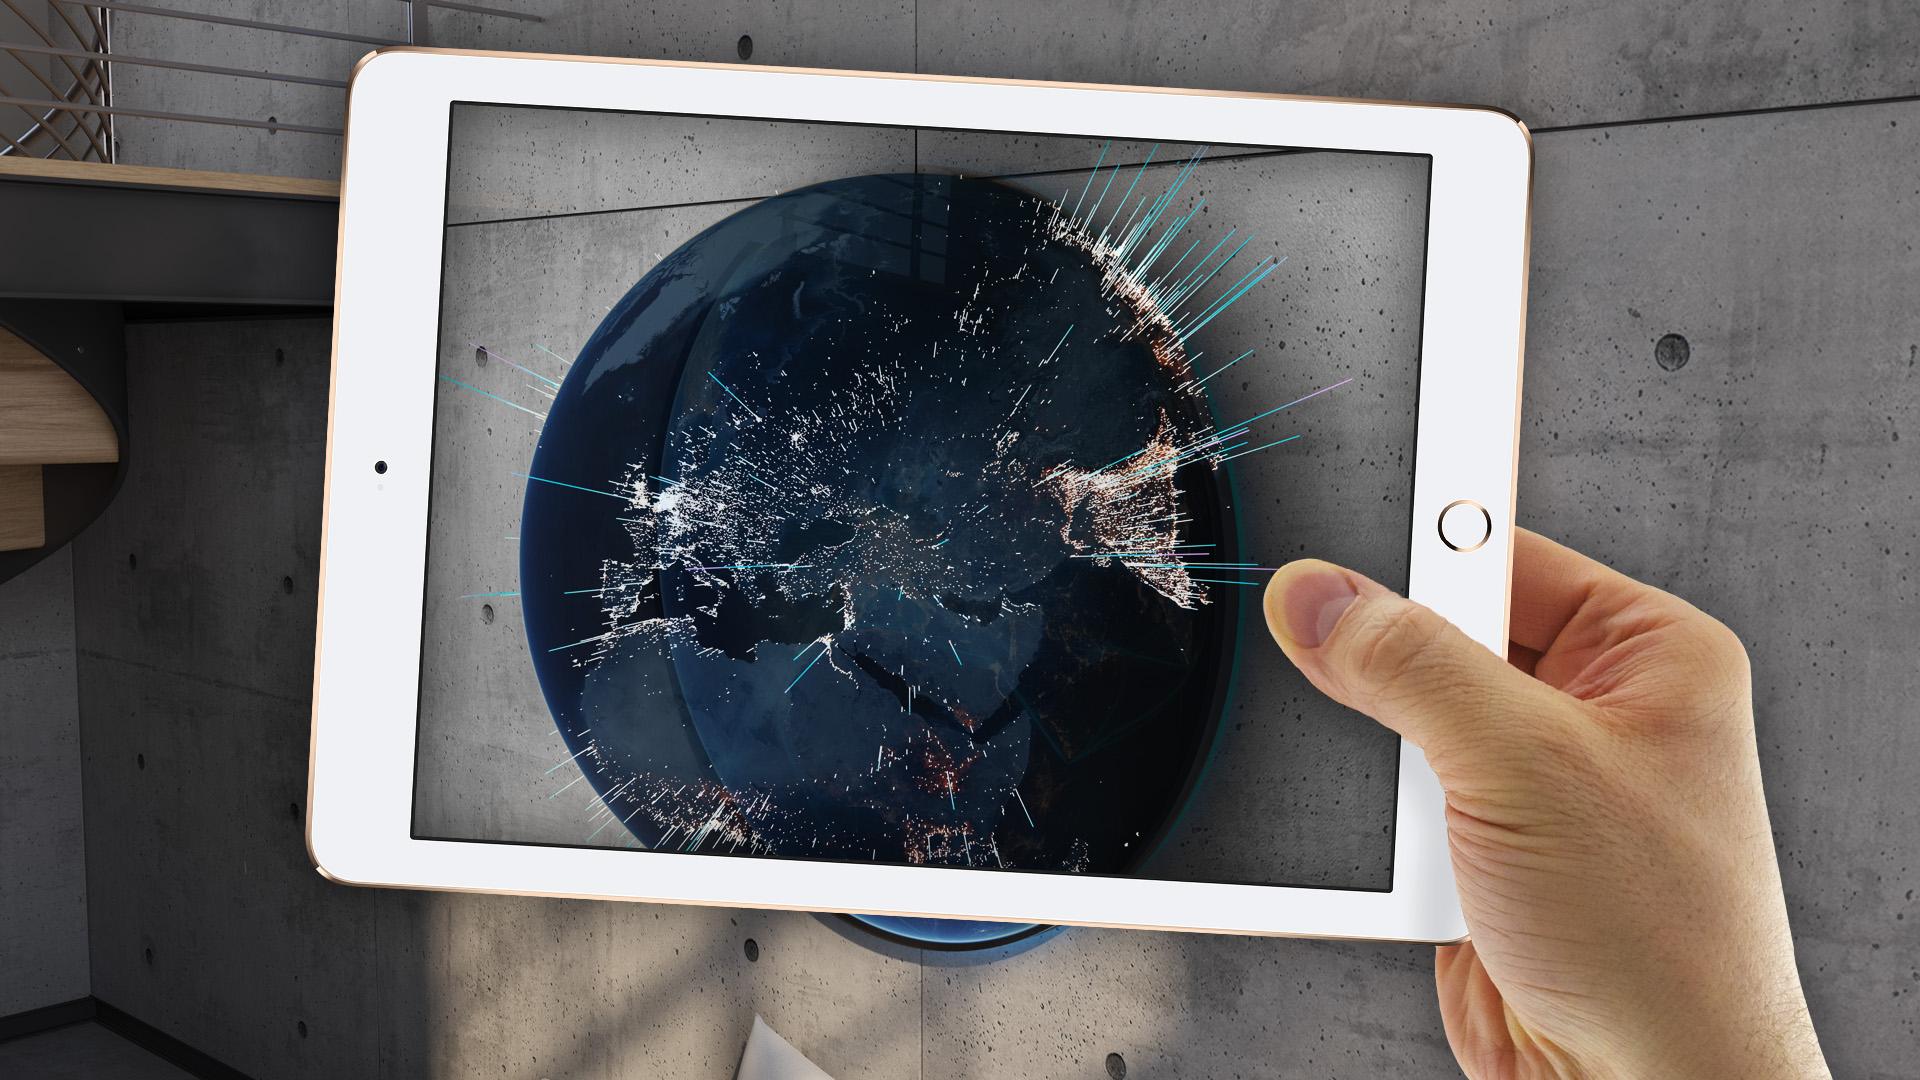 ARterra - Augmented artworks for planeteersComing soon